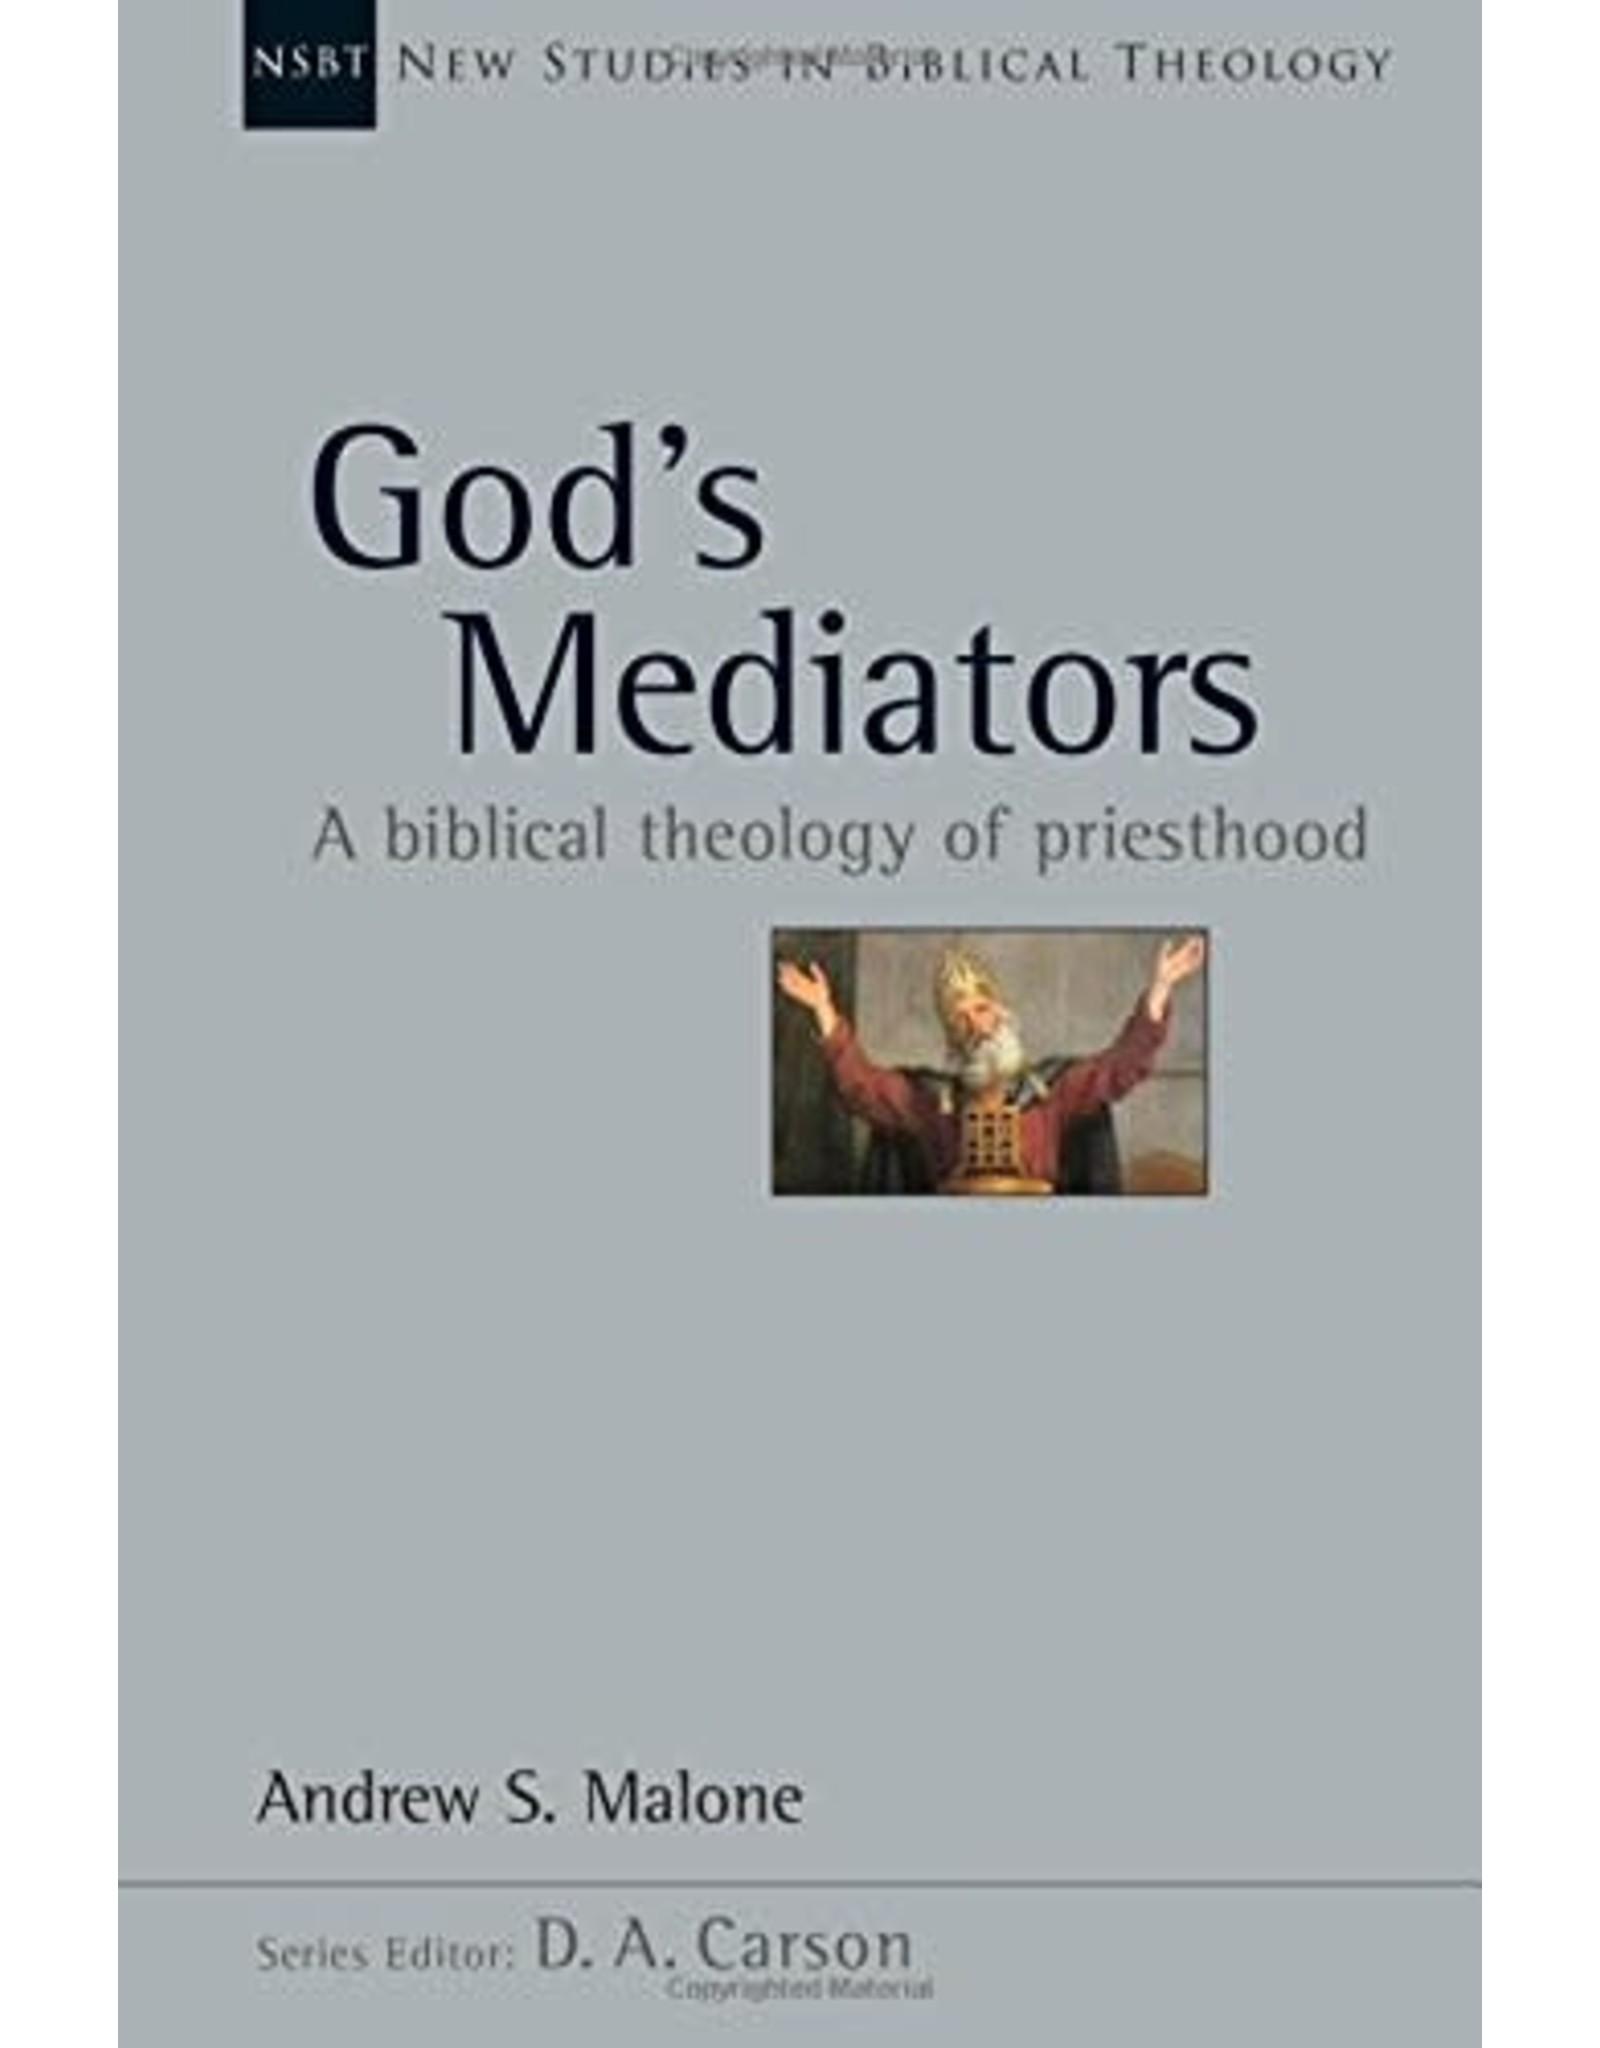 InterVarsity Press (IVP) God's Mediators: A Biblical Theology of Priesthood (New Studies in Biblical Theology)